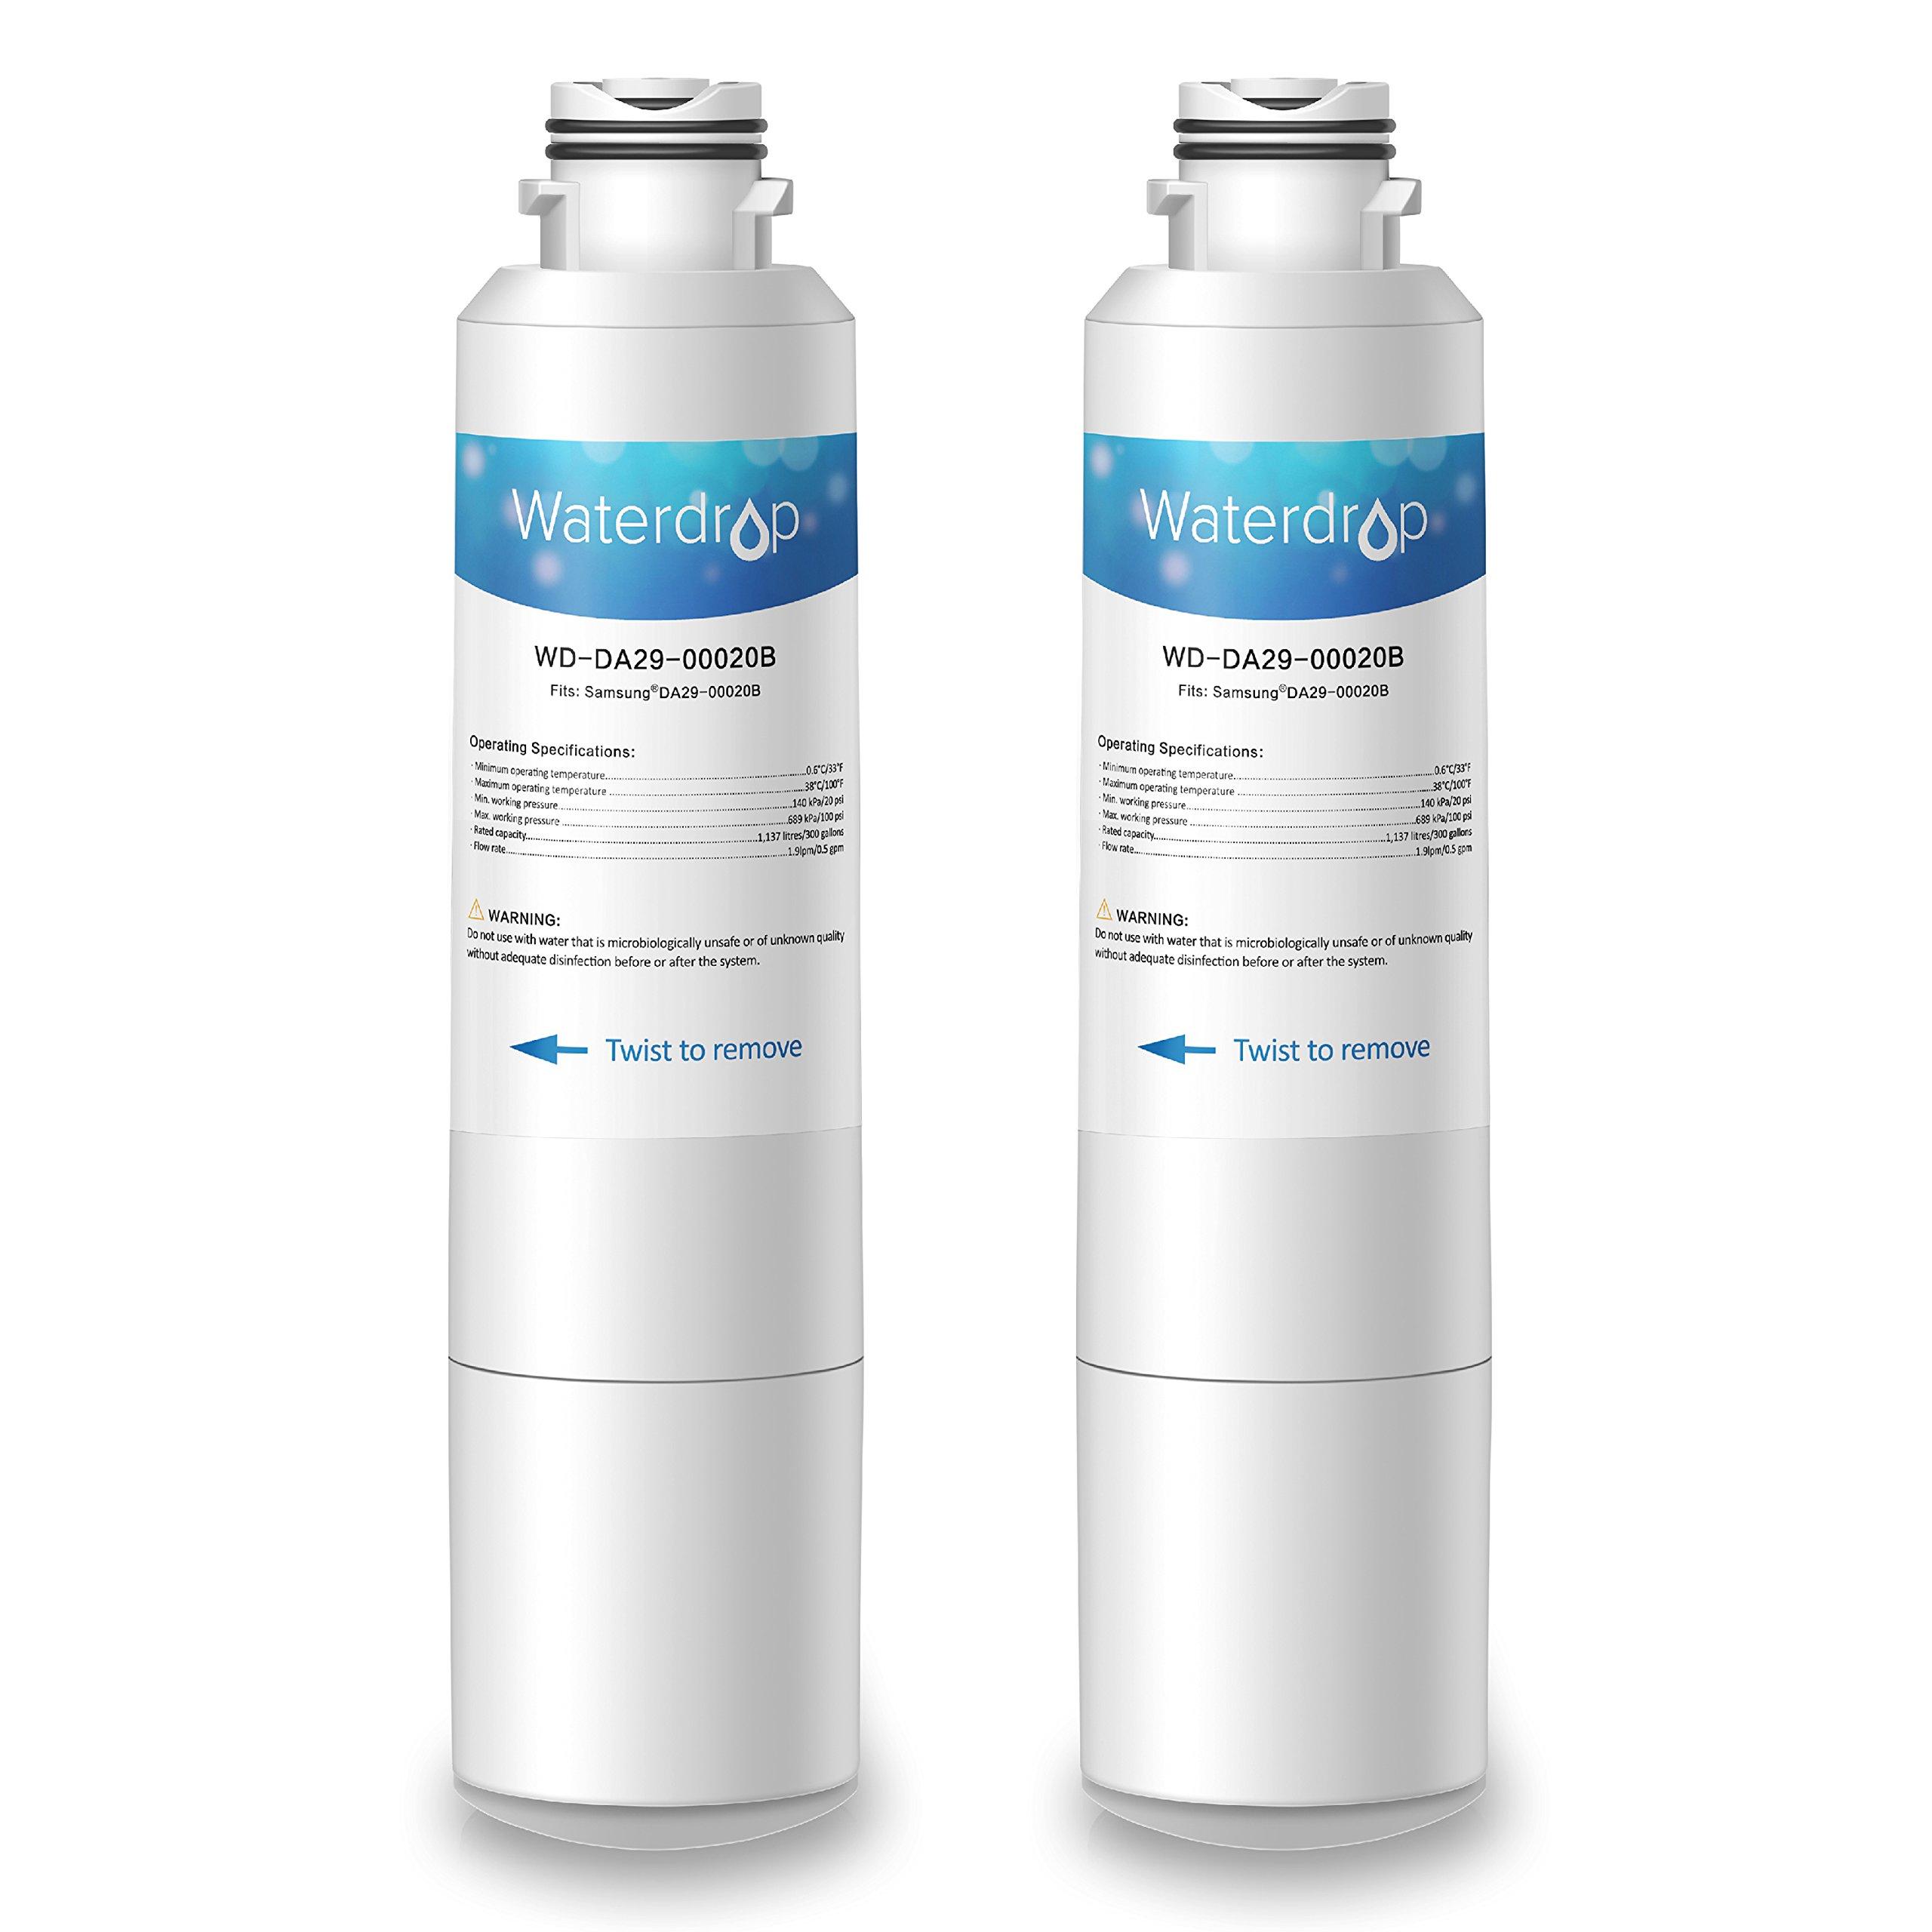 Waterdrop DA29-00020B Refrigerator Water Filter Replacement for Samsung DA29-00020B, DA29-00020A, HAF-CIN/EXP, 46-9101, Standard Series, 2 Pack